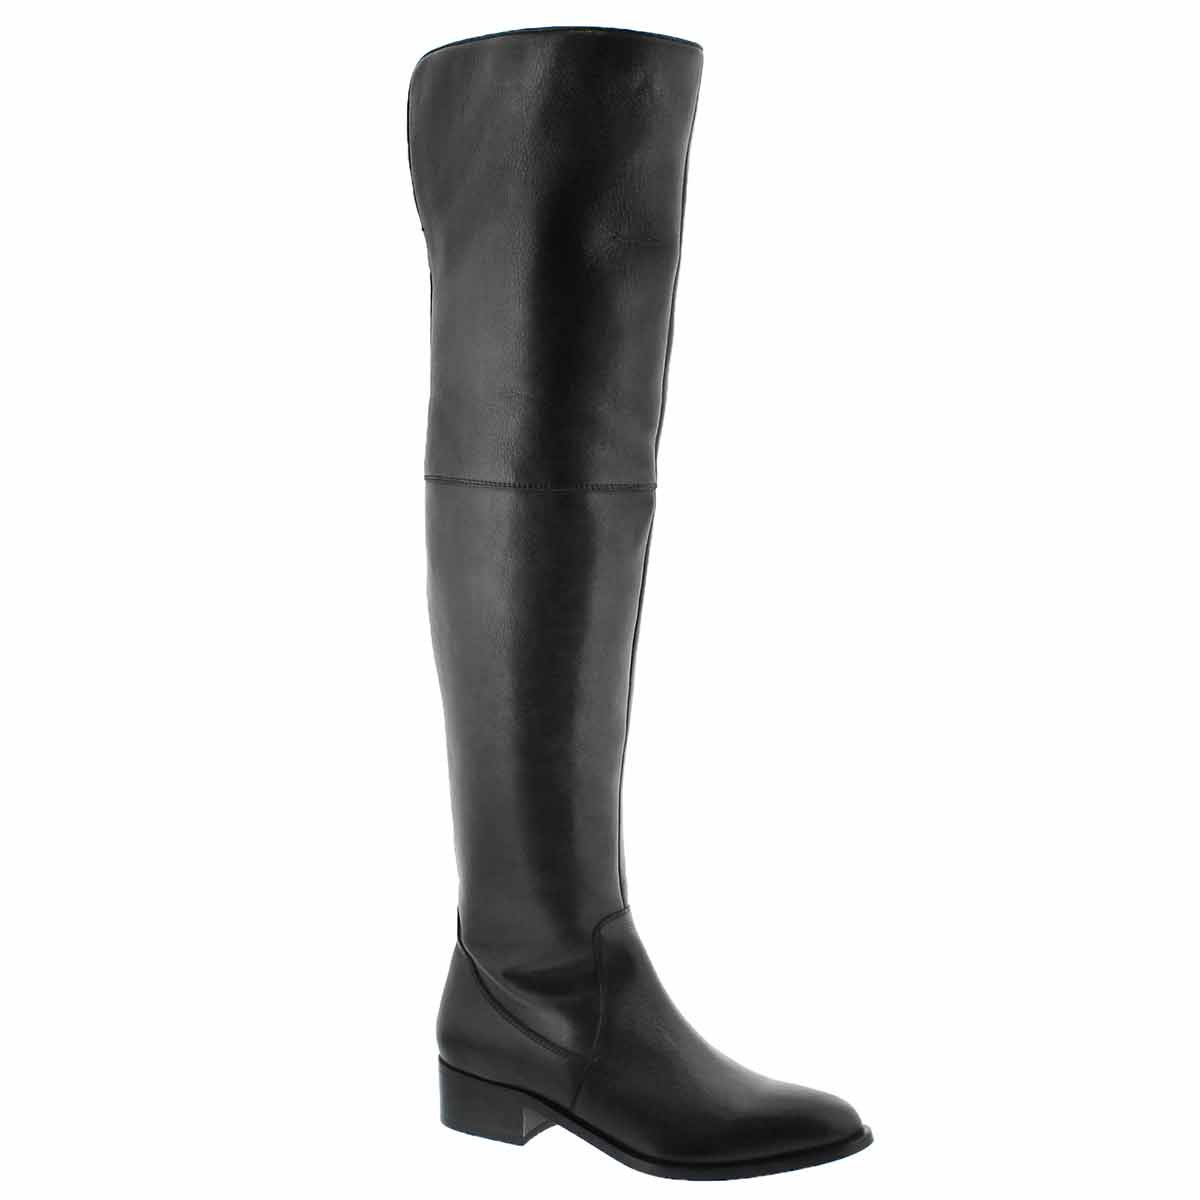 Women's LAINEY black knee high boots